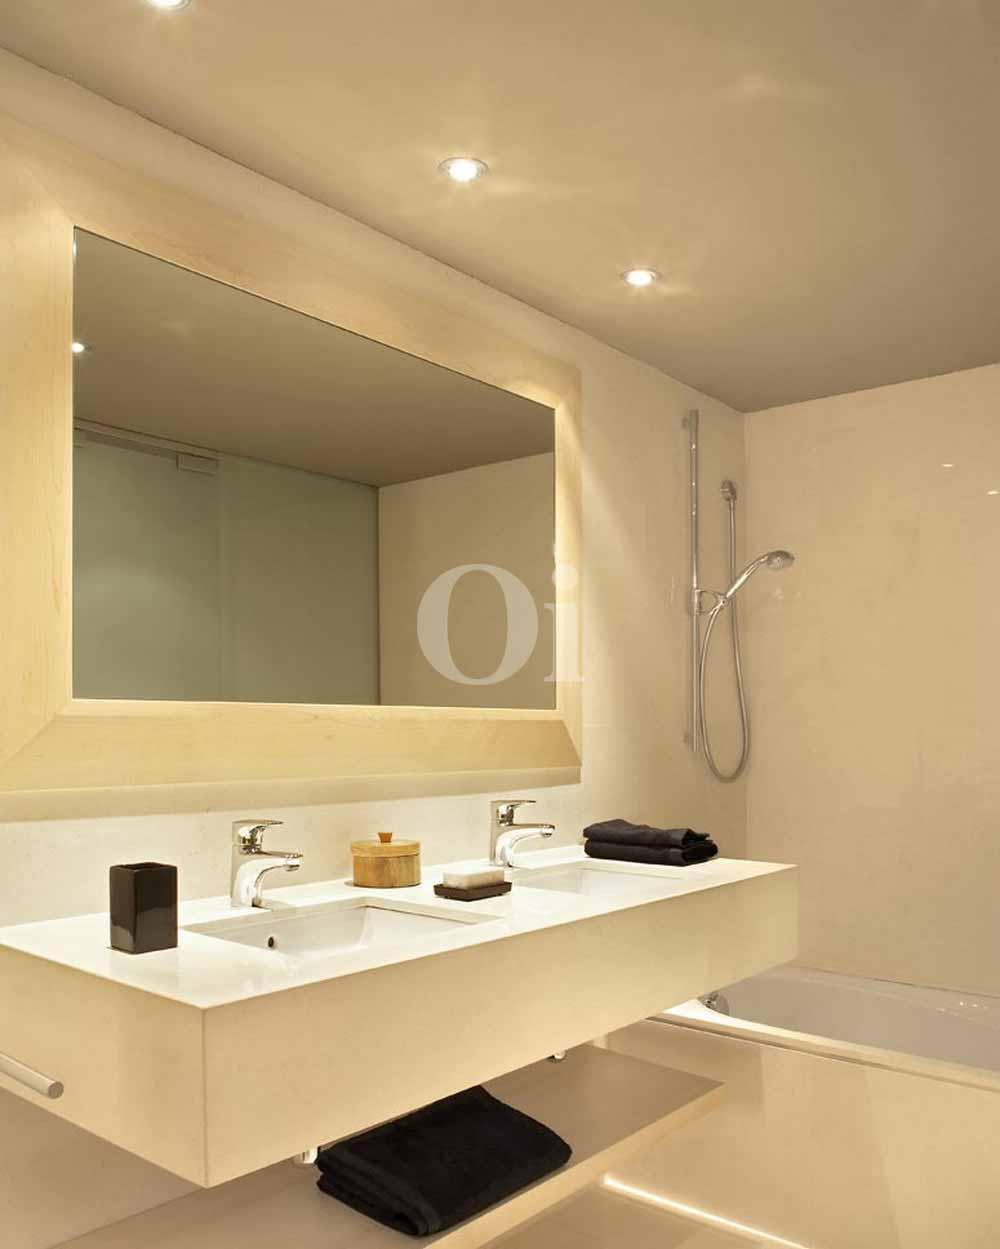 Ванная комната квартиры на продажу в Барселоне